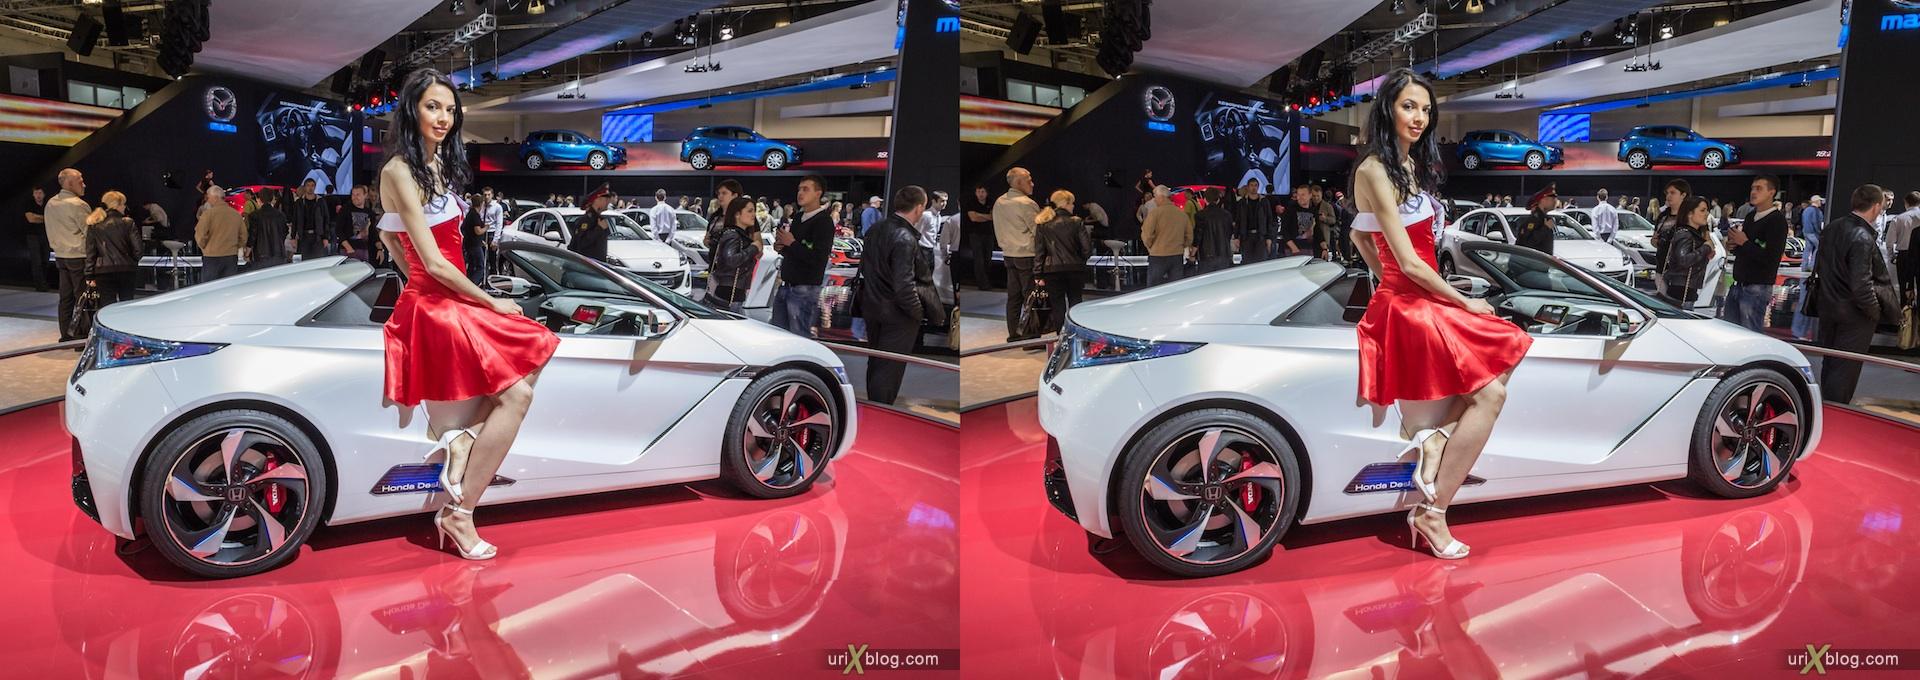 2012, Honda, Moscow International Automobile Salon, девушка, модель, girl, model, auto show, 3D, stereo pair, cross-eyed, crossview